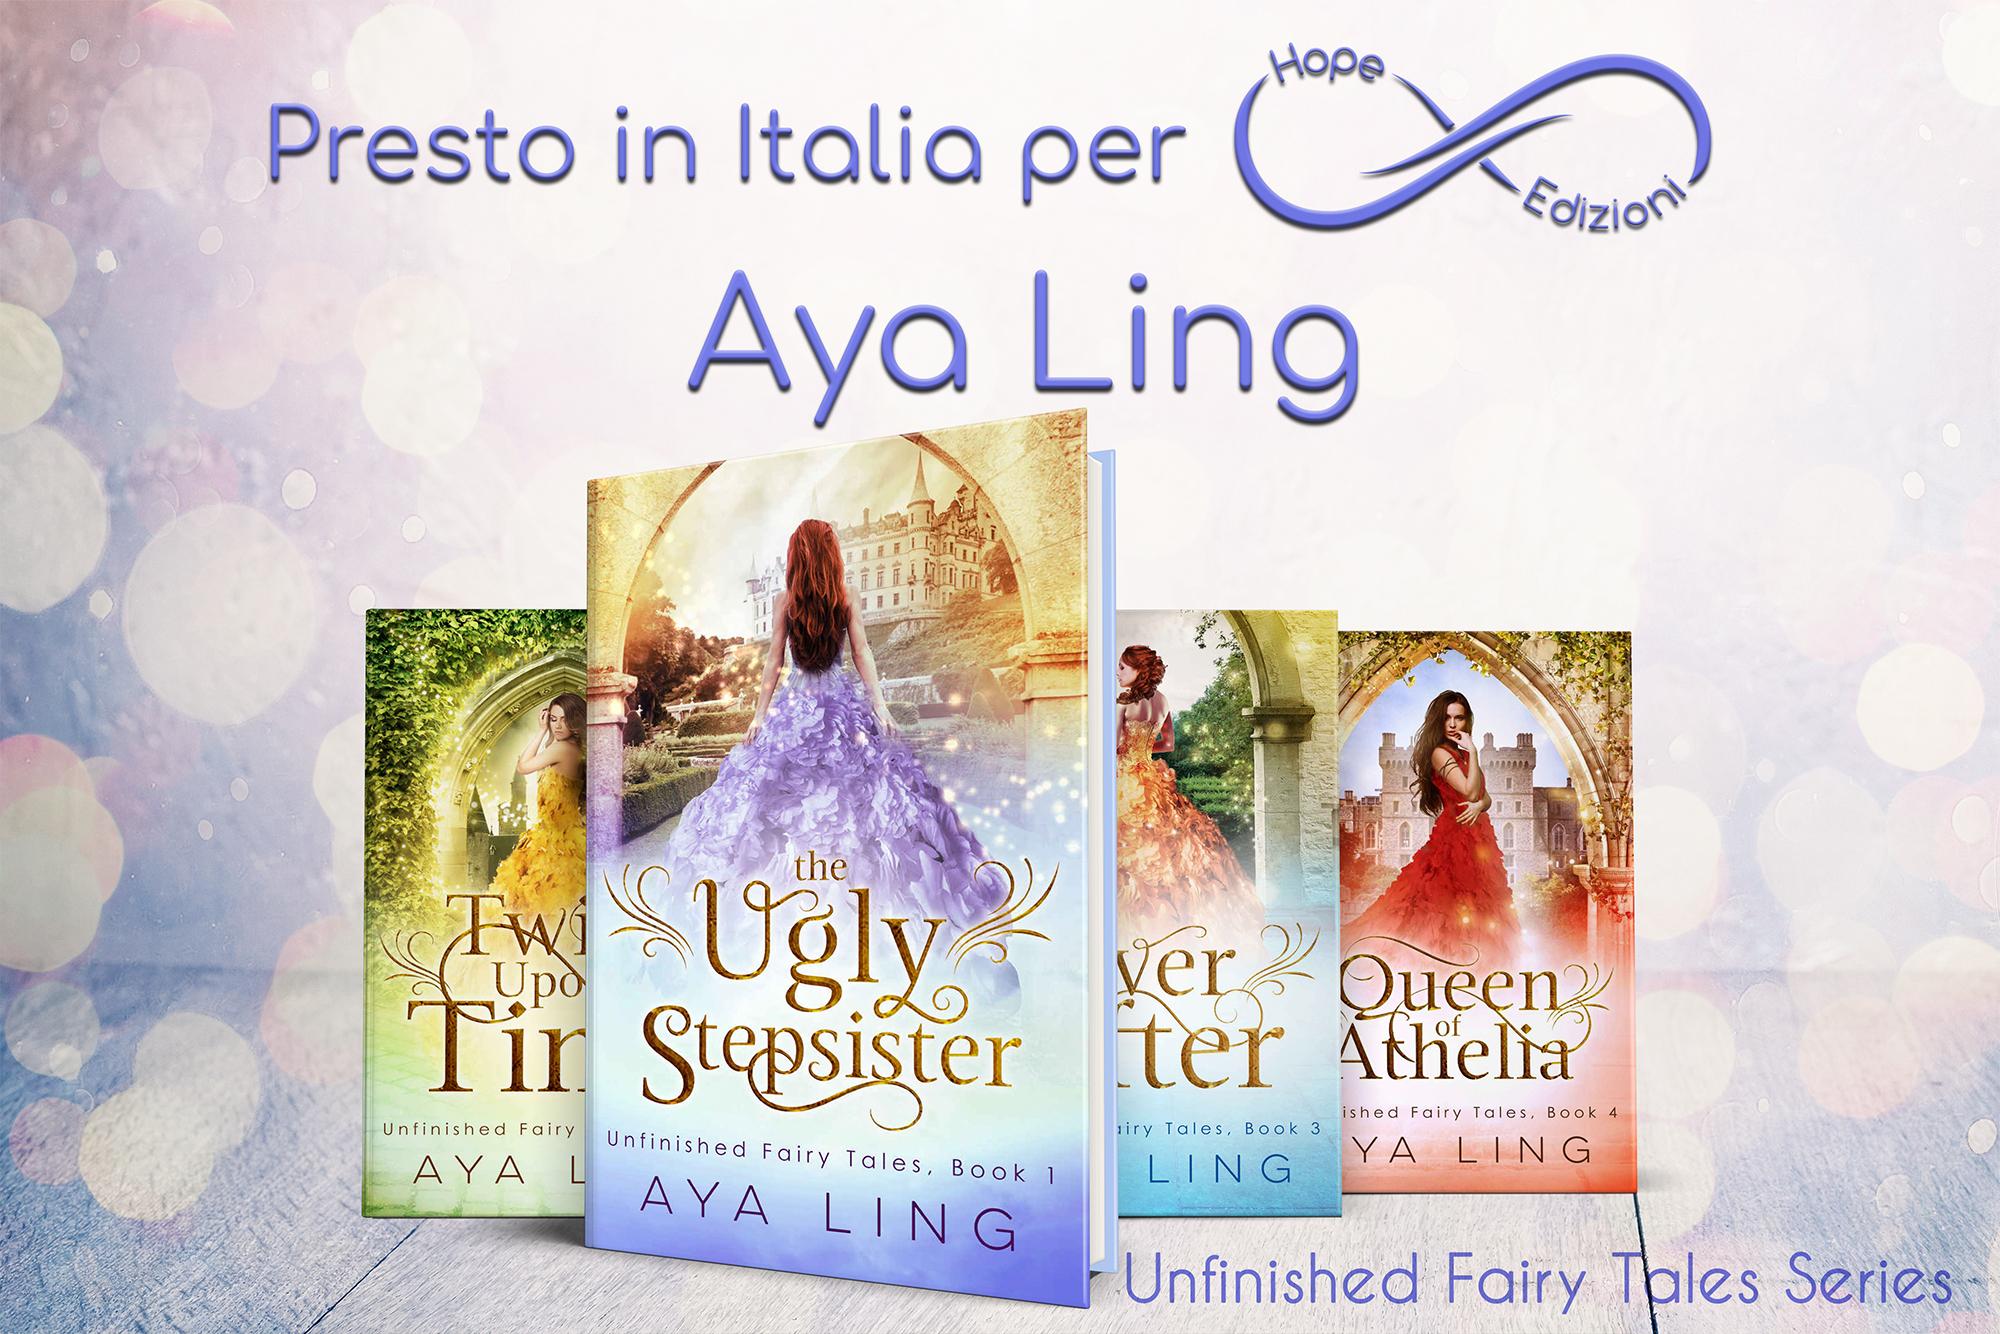 Presto in Italia… Aya Ling!